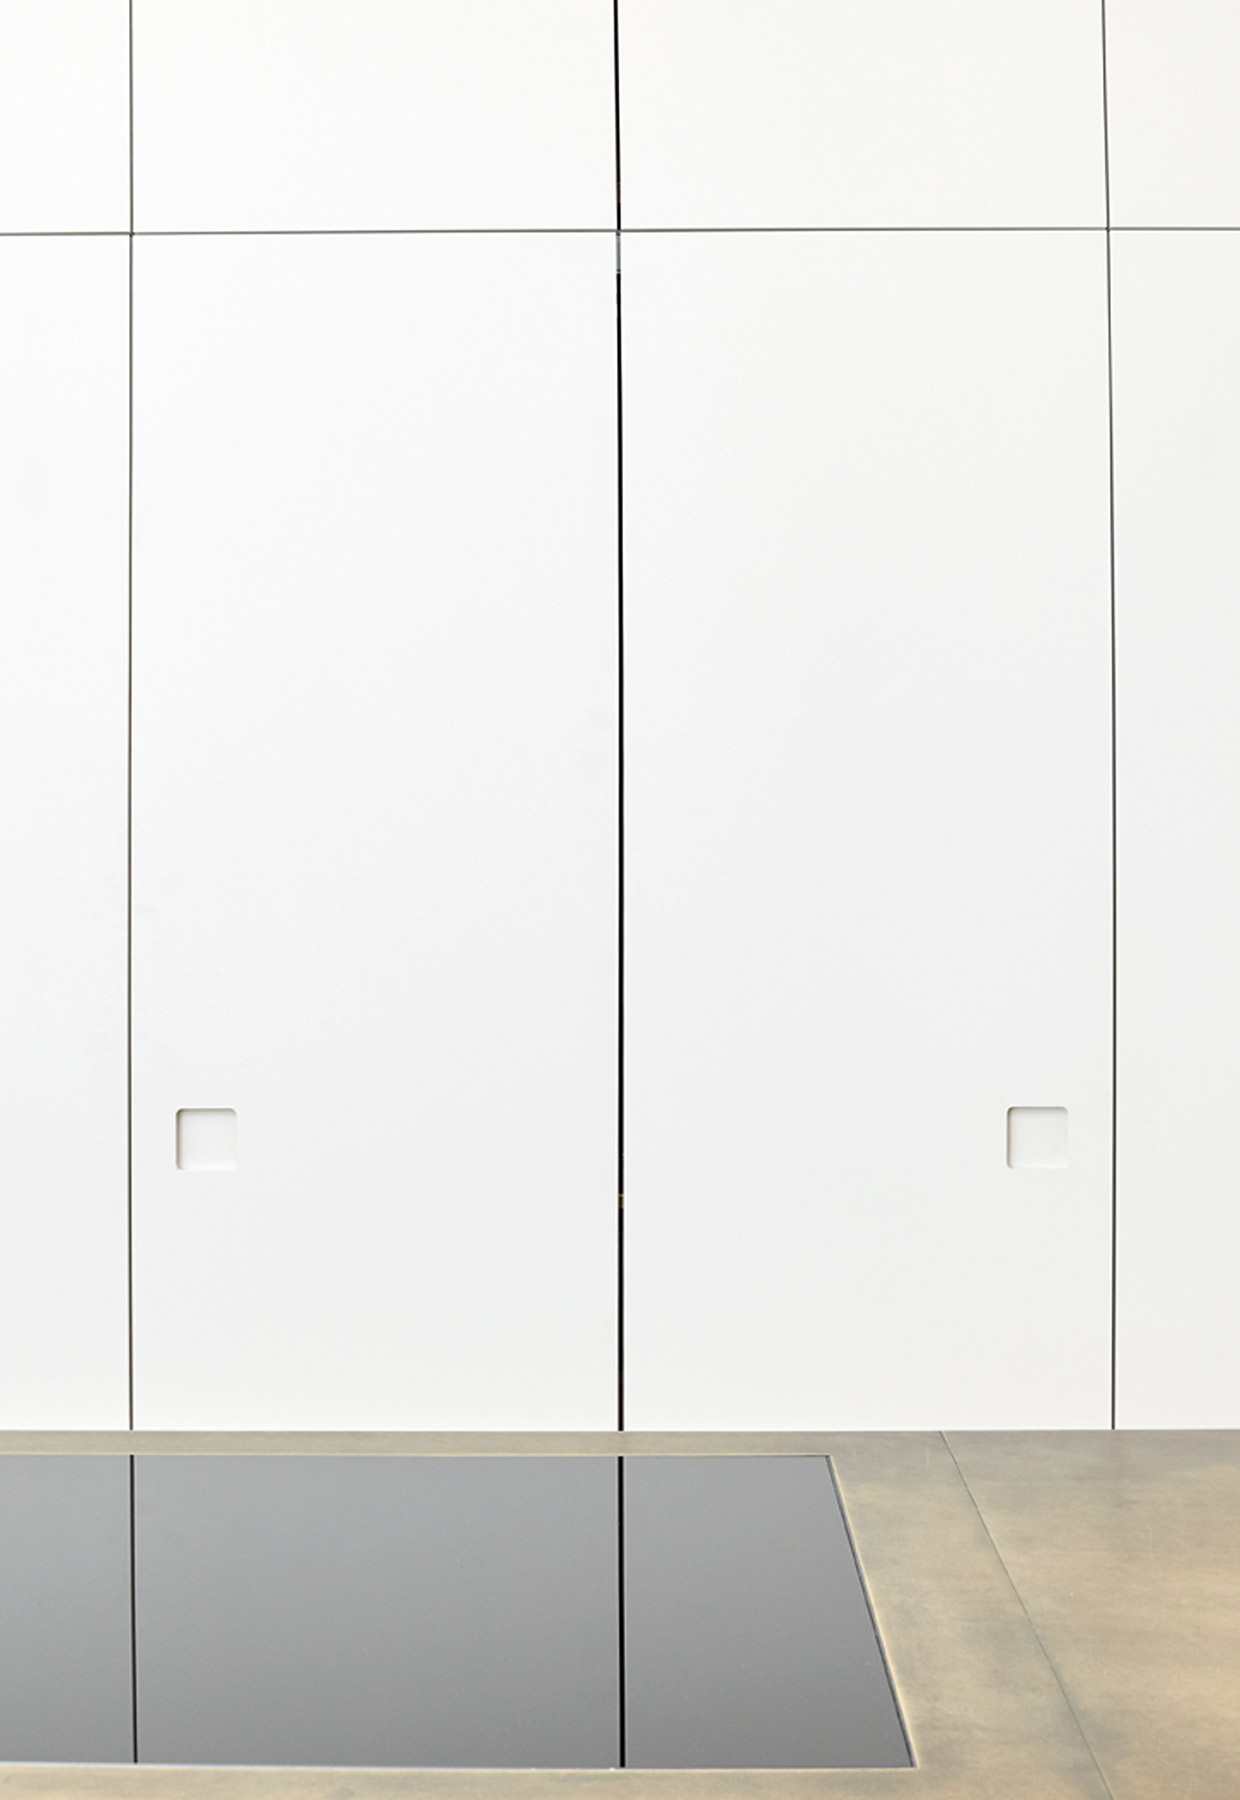 Nuova forma allo spazio - Clear new room Katharina Bohm